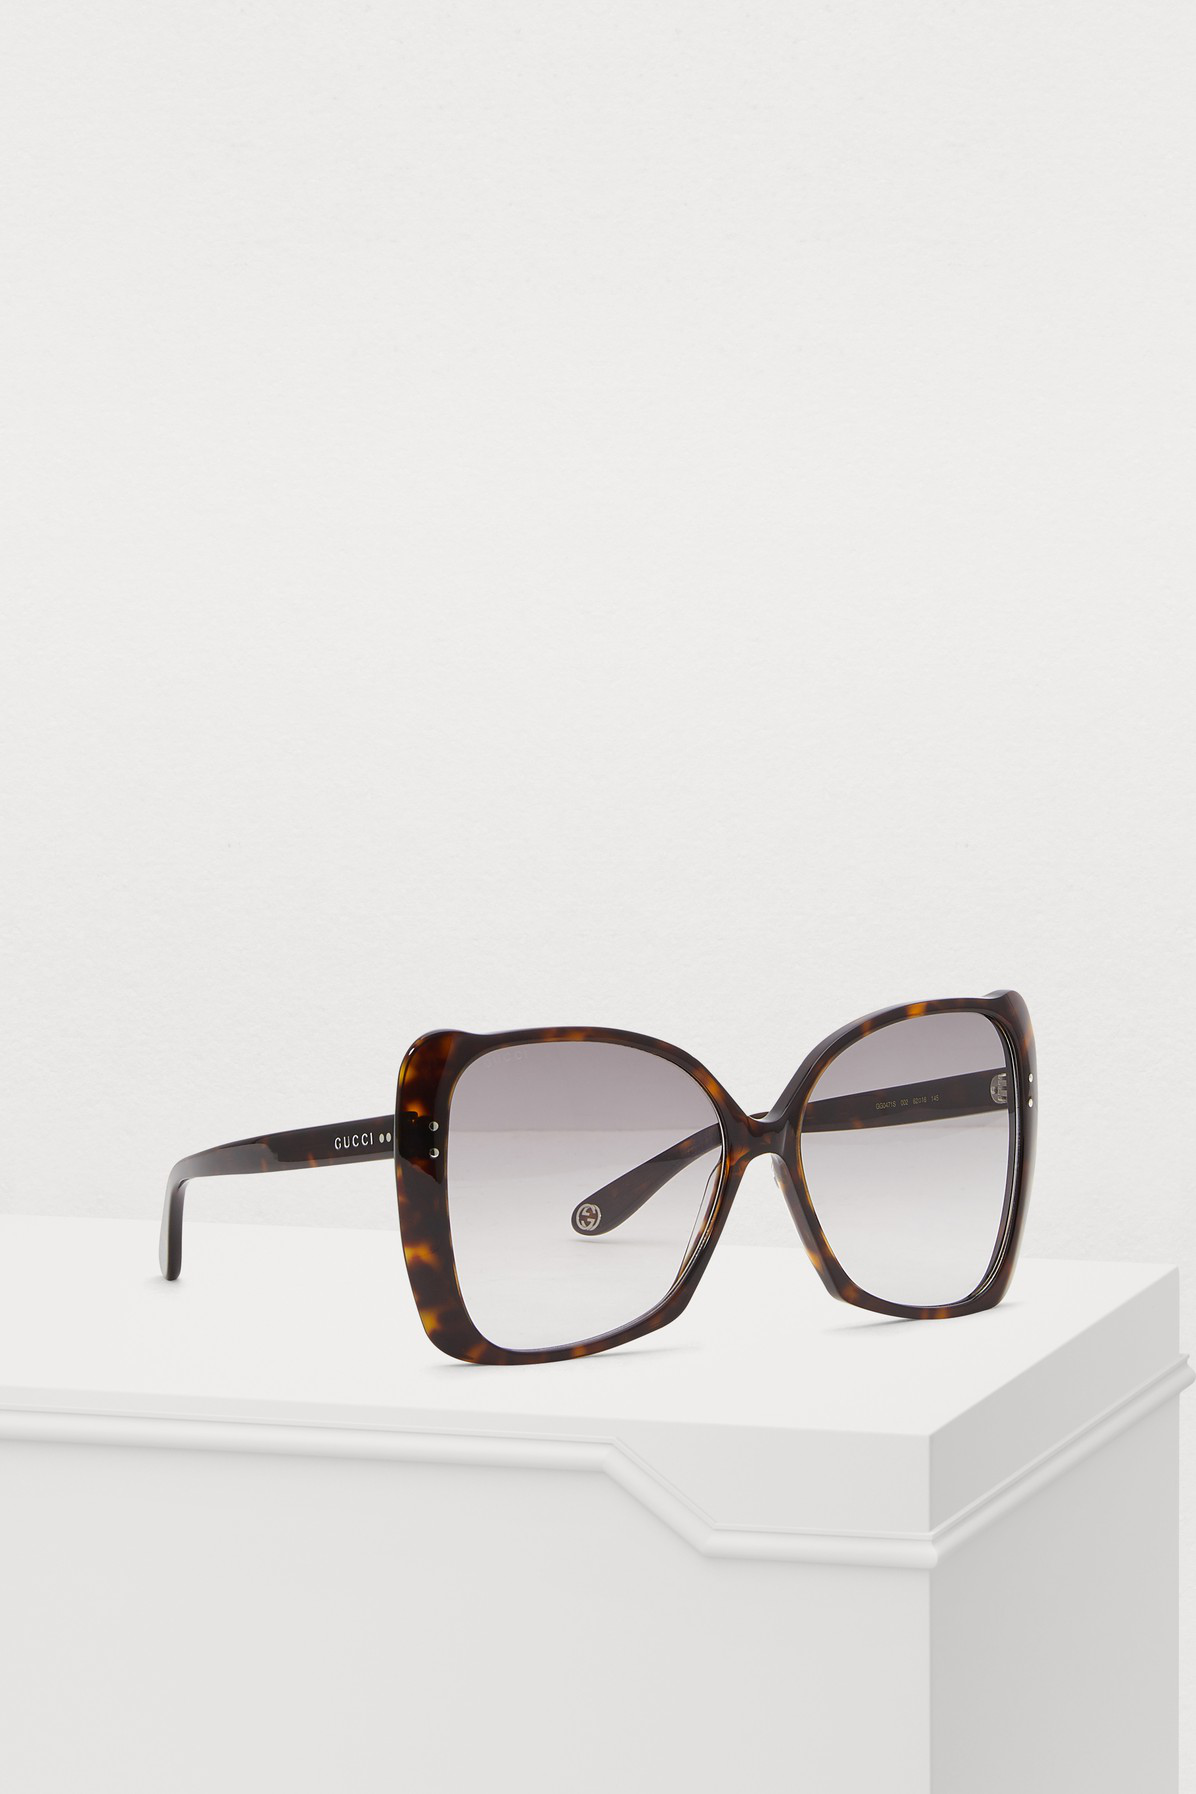 f1a9ce9b743 Gucci Butterfly Sunglasses